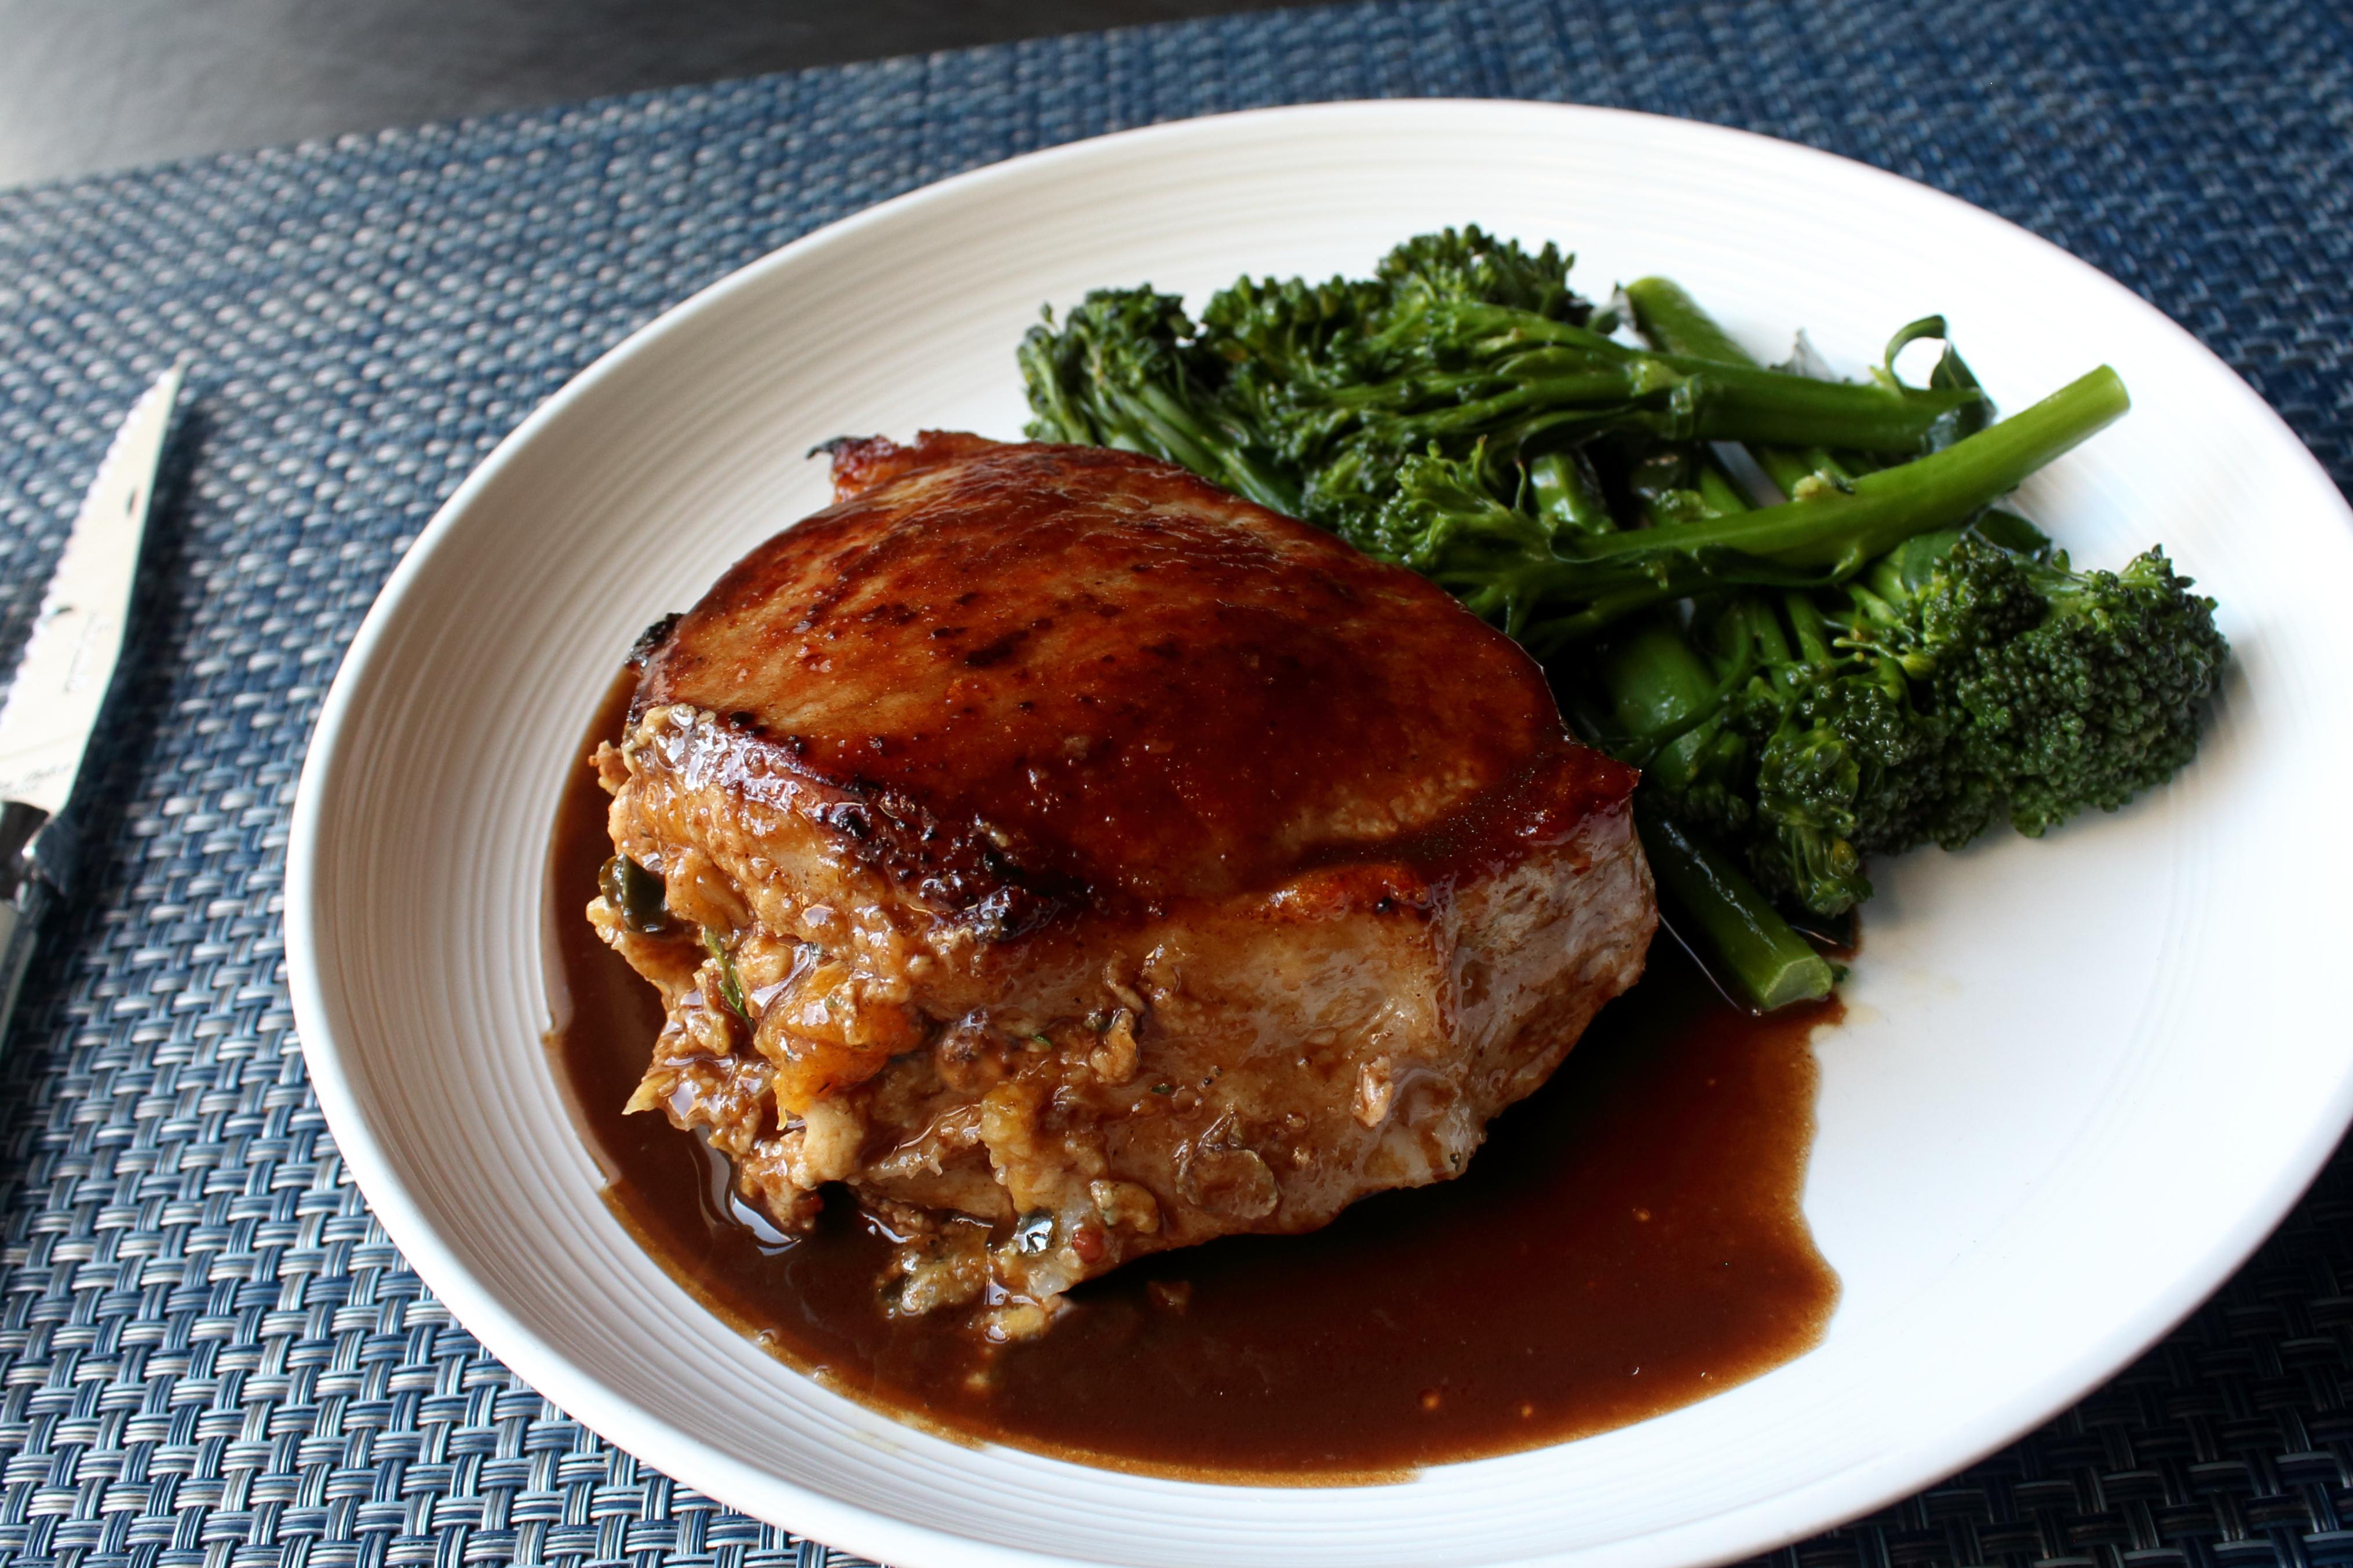 Peach-Stuffed Pork Chops Allrecipes Magazine